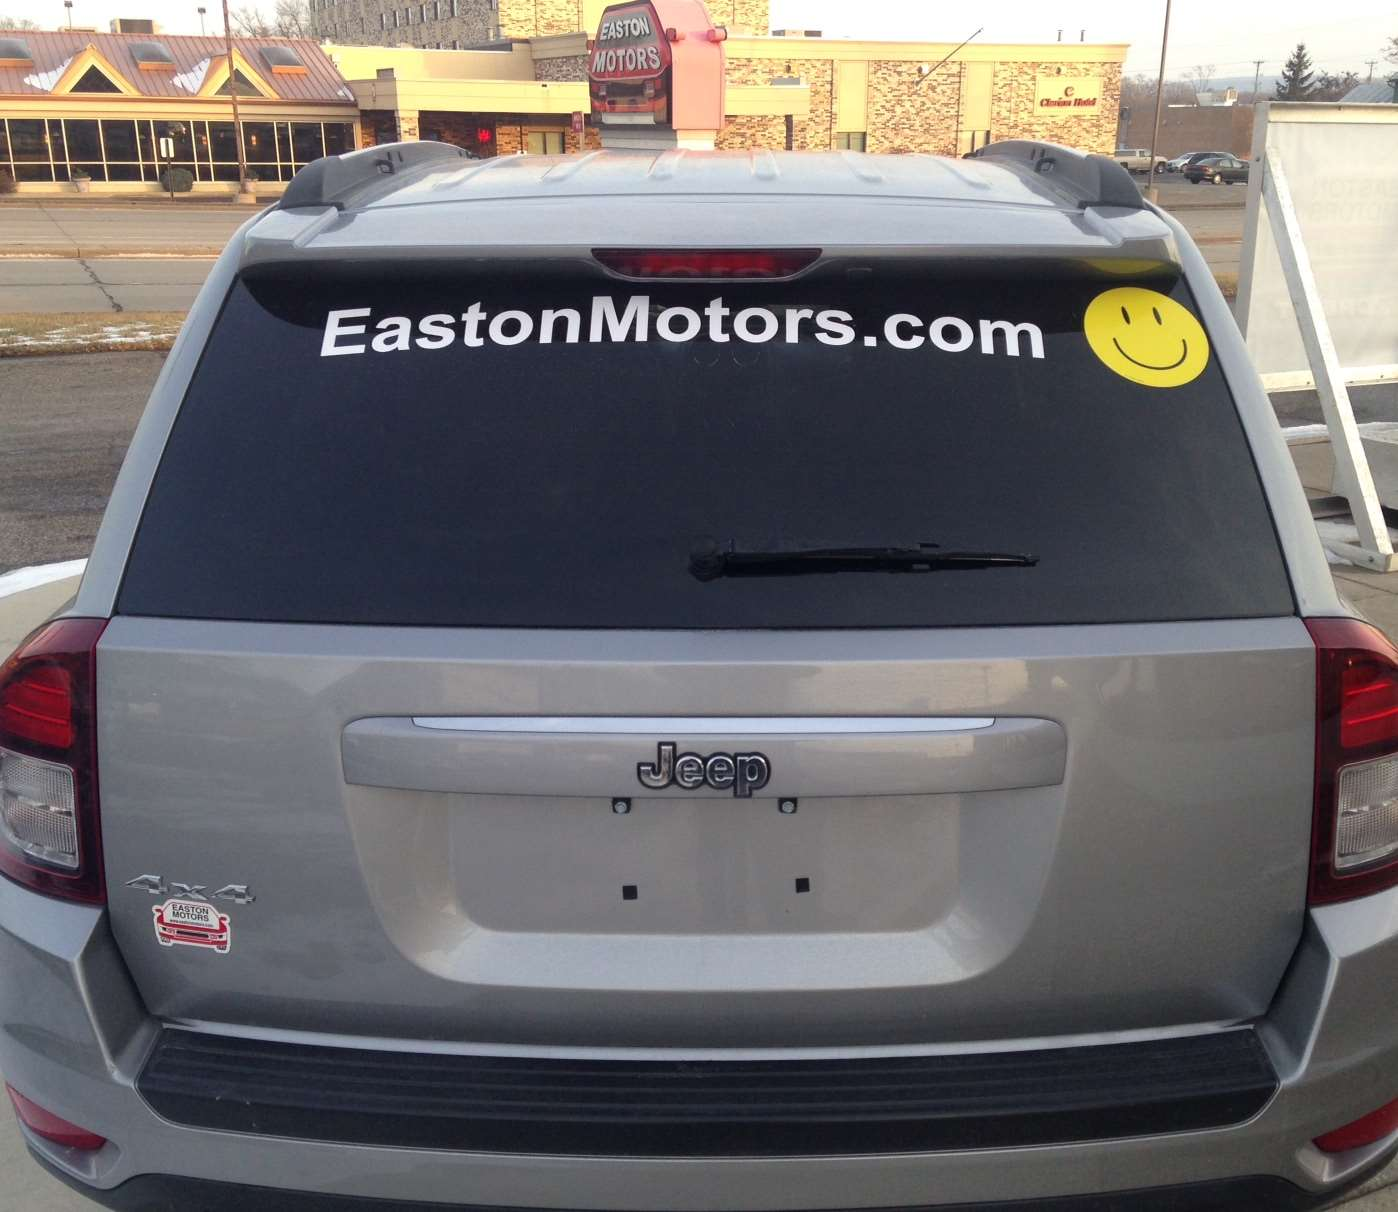 Half price oild changes with Easton Motors Sticker